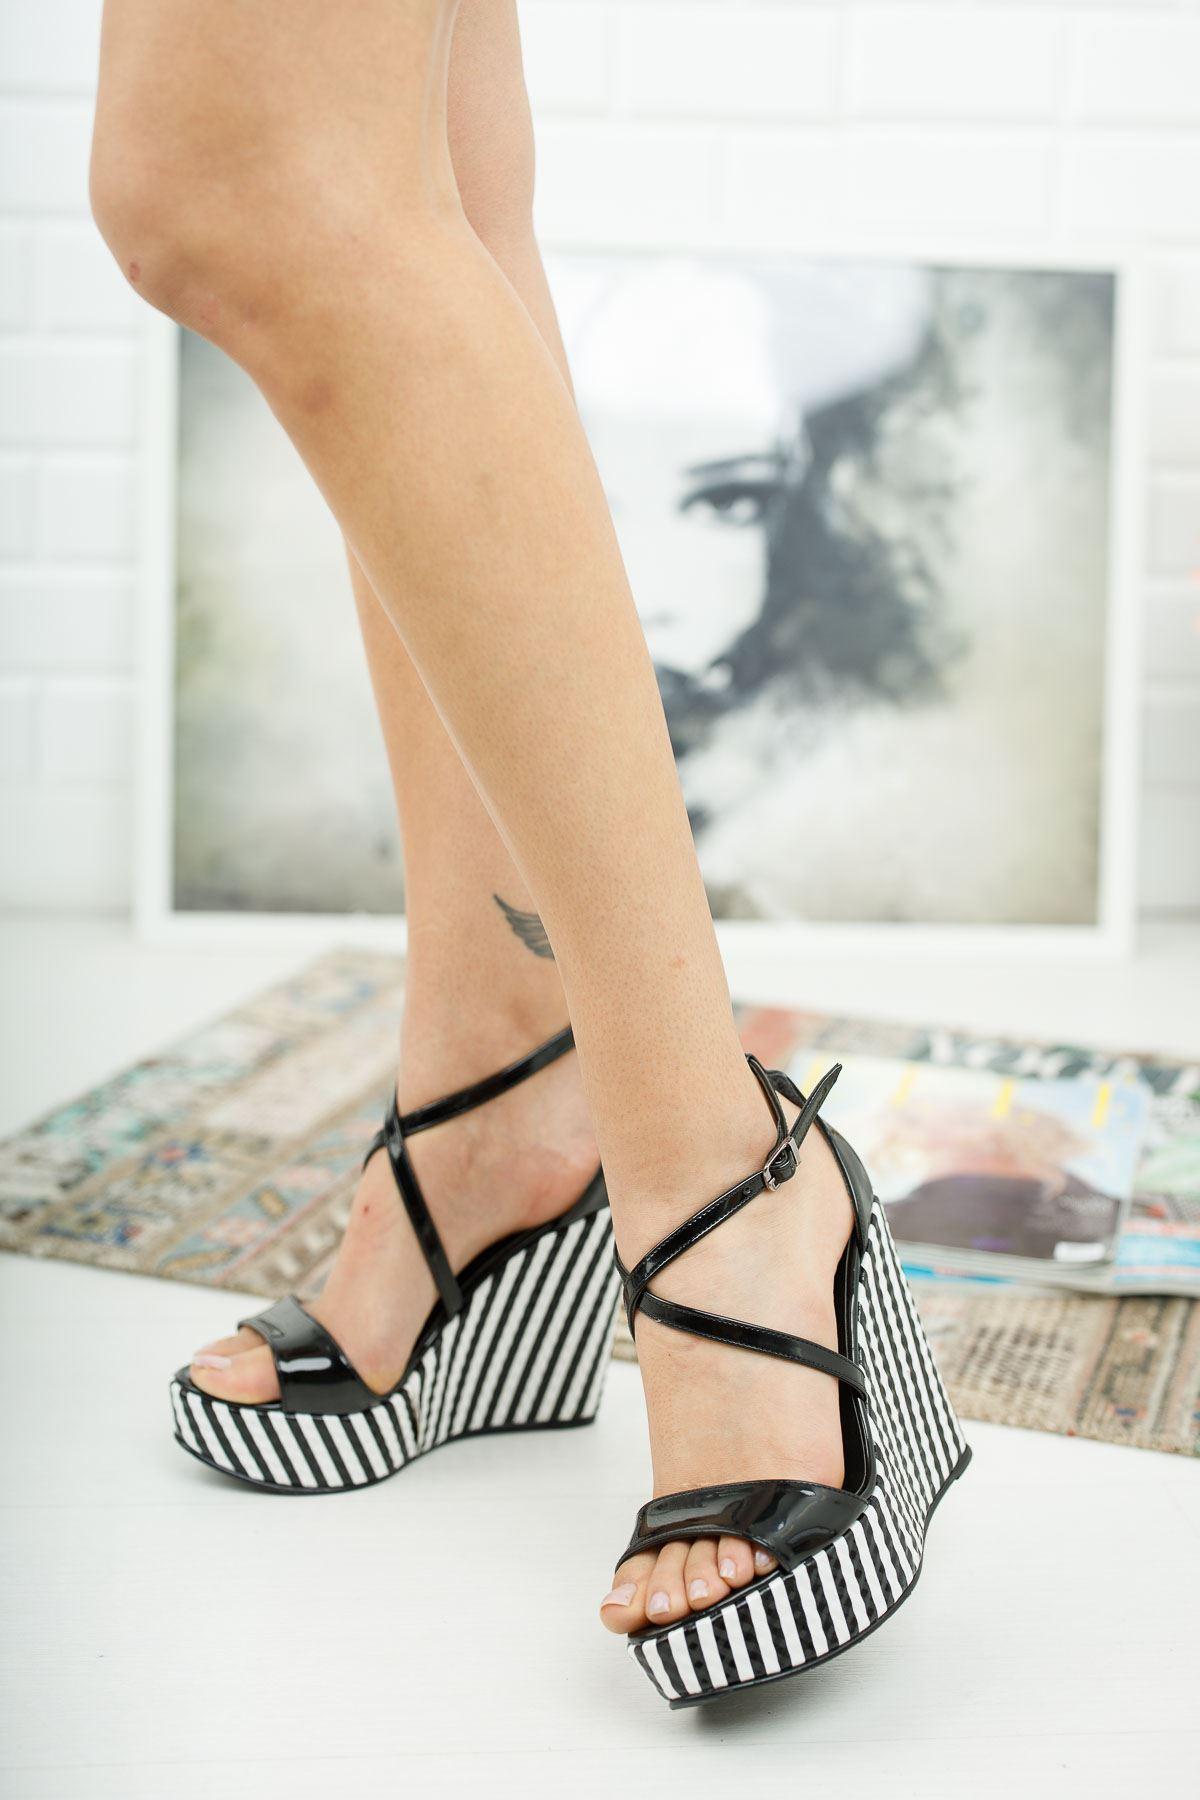 Mable Siyah Rugan Çizgili Dolgu Topuklu Ayakkabı